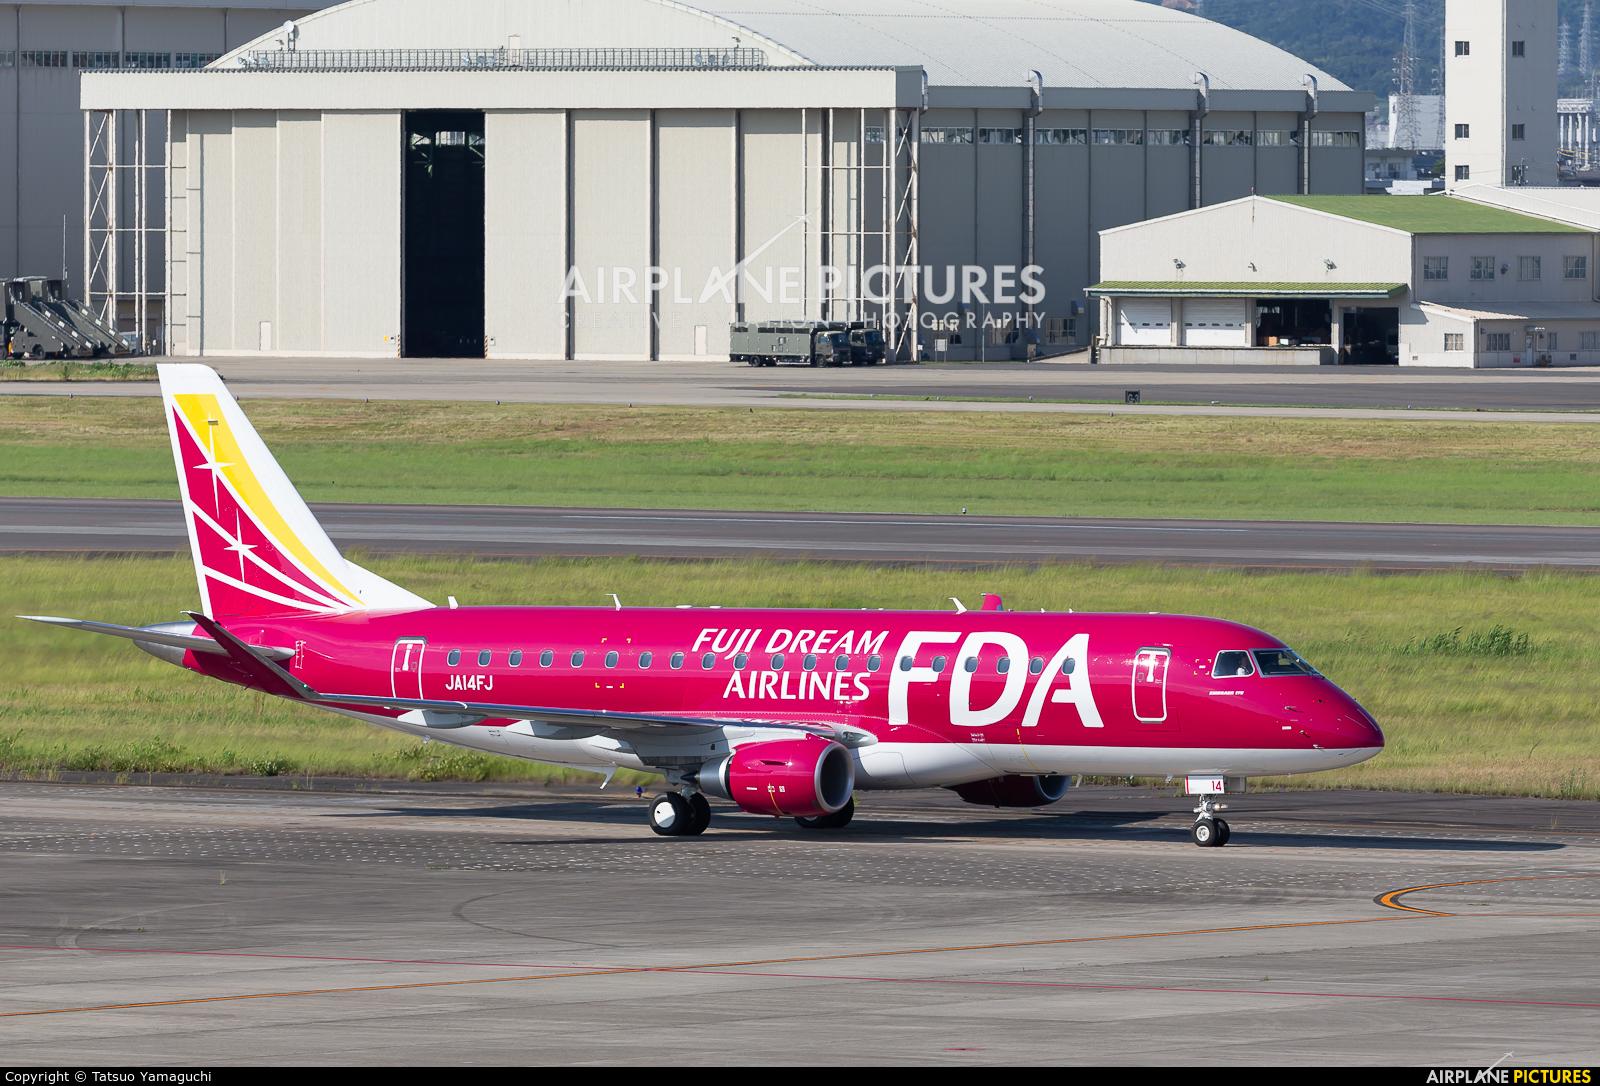 Fuji Dream Airlines JA14FJ aircraft at Nagoya - Komaki AB